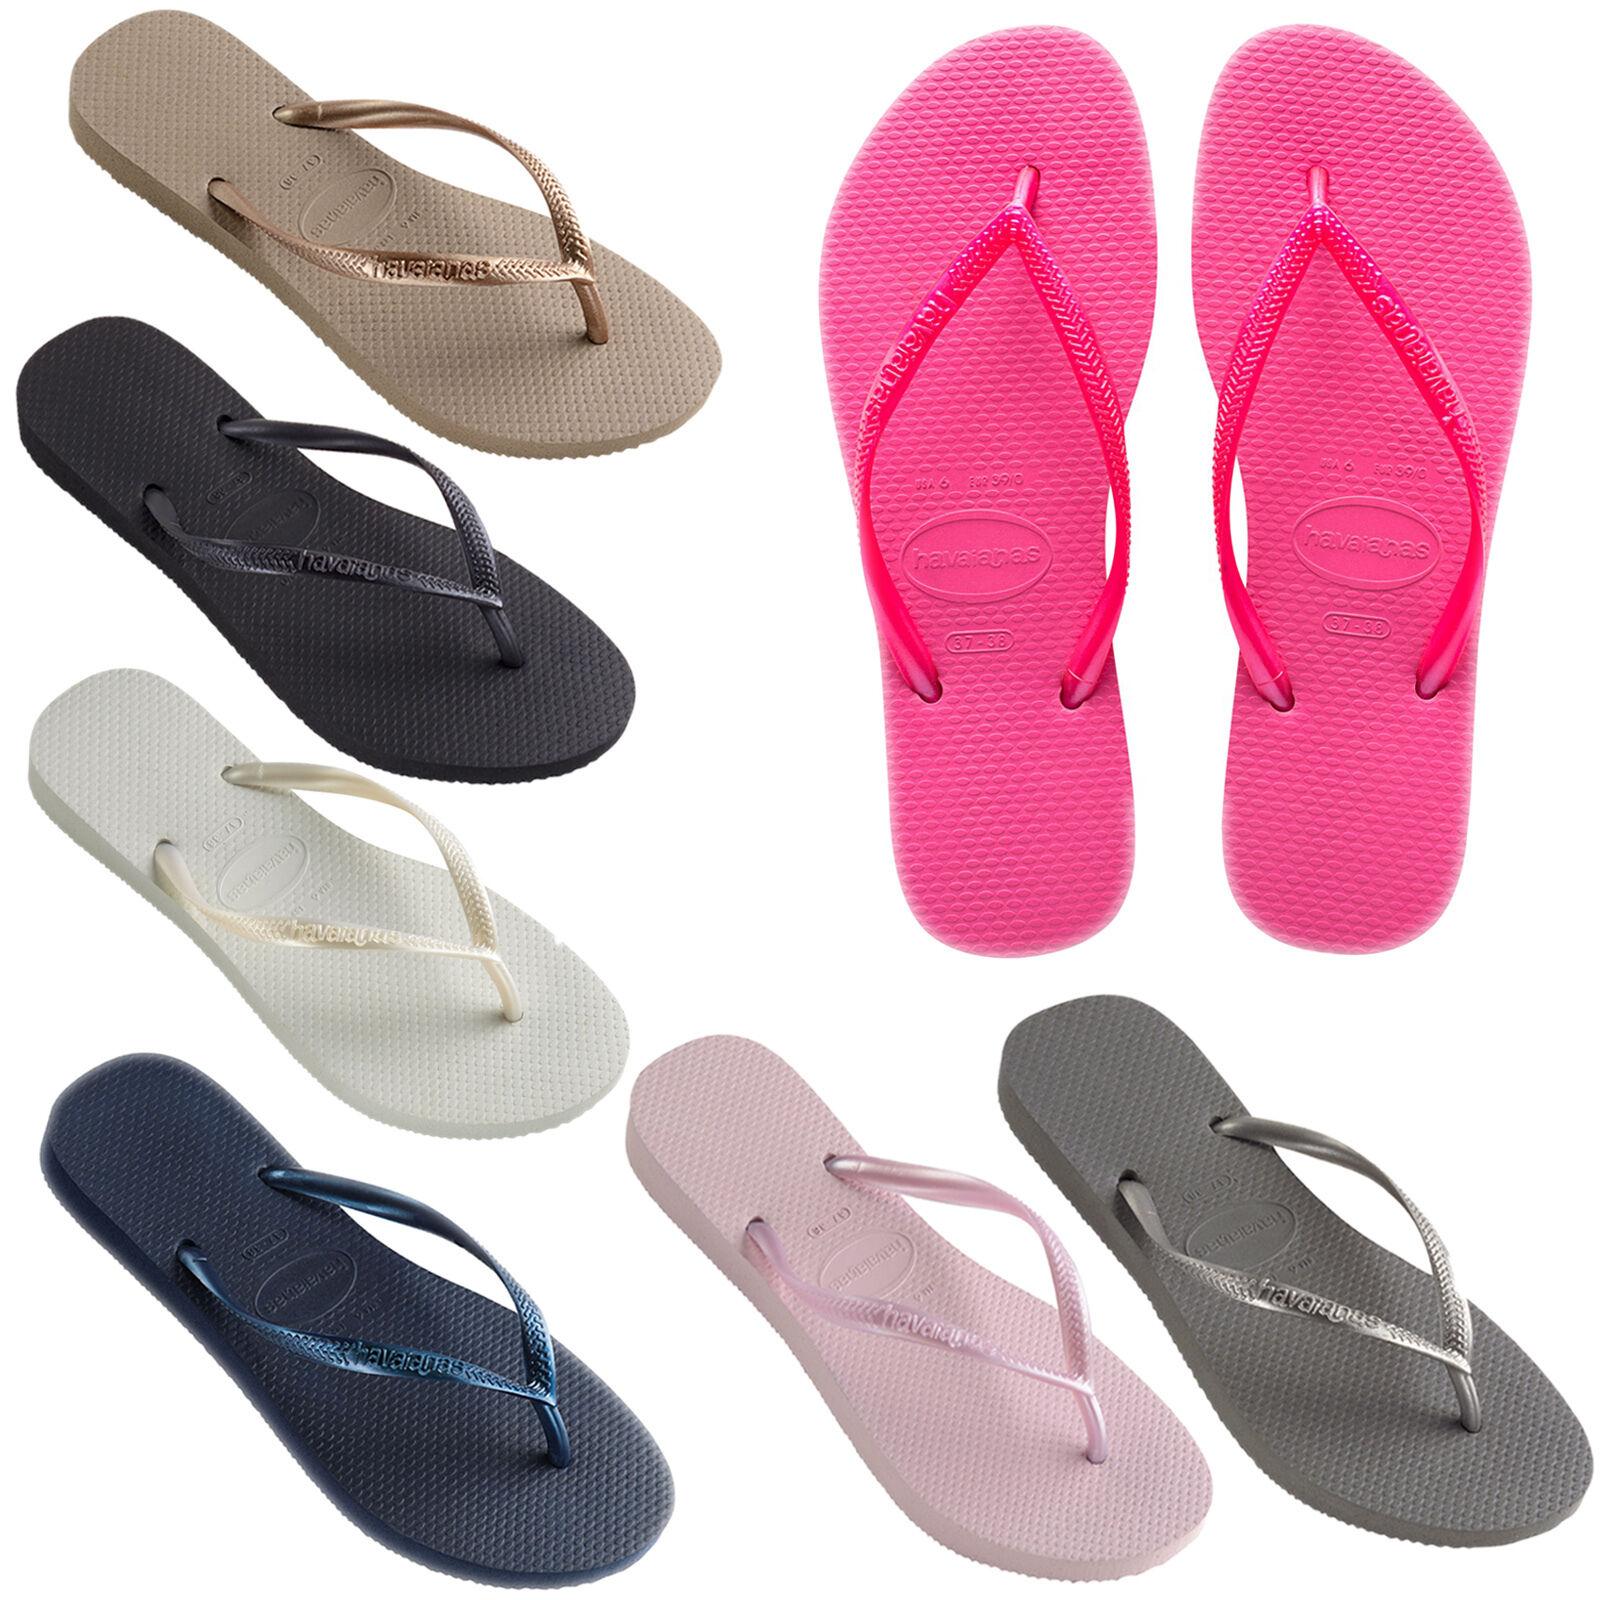 White n Silver Two Tone Lace-up Sneaker Heel Mule Suede Stiletto Pointy Toe Sz 7